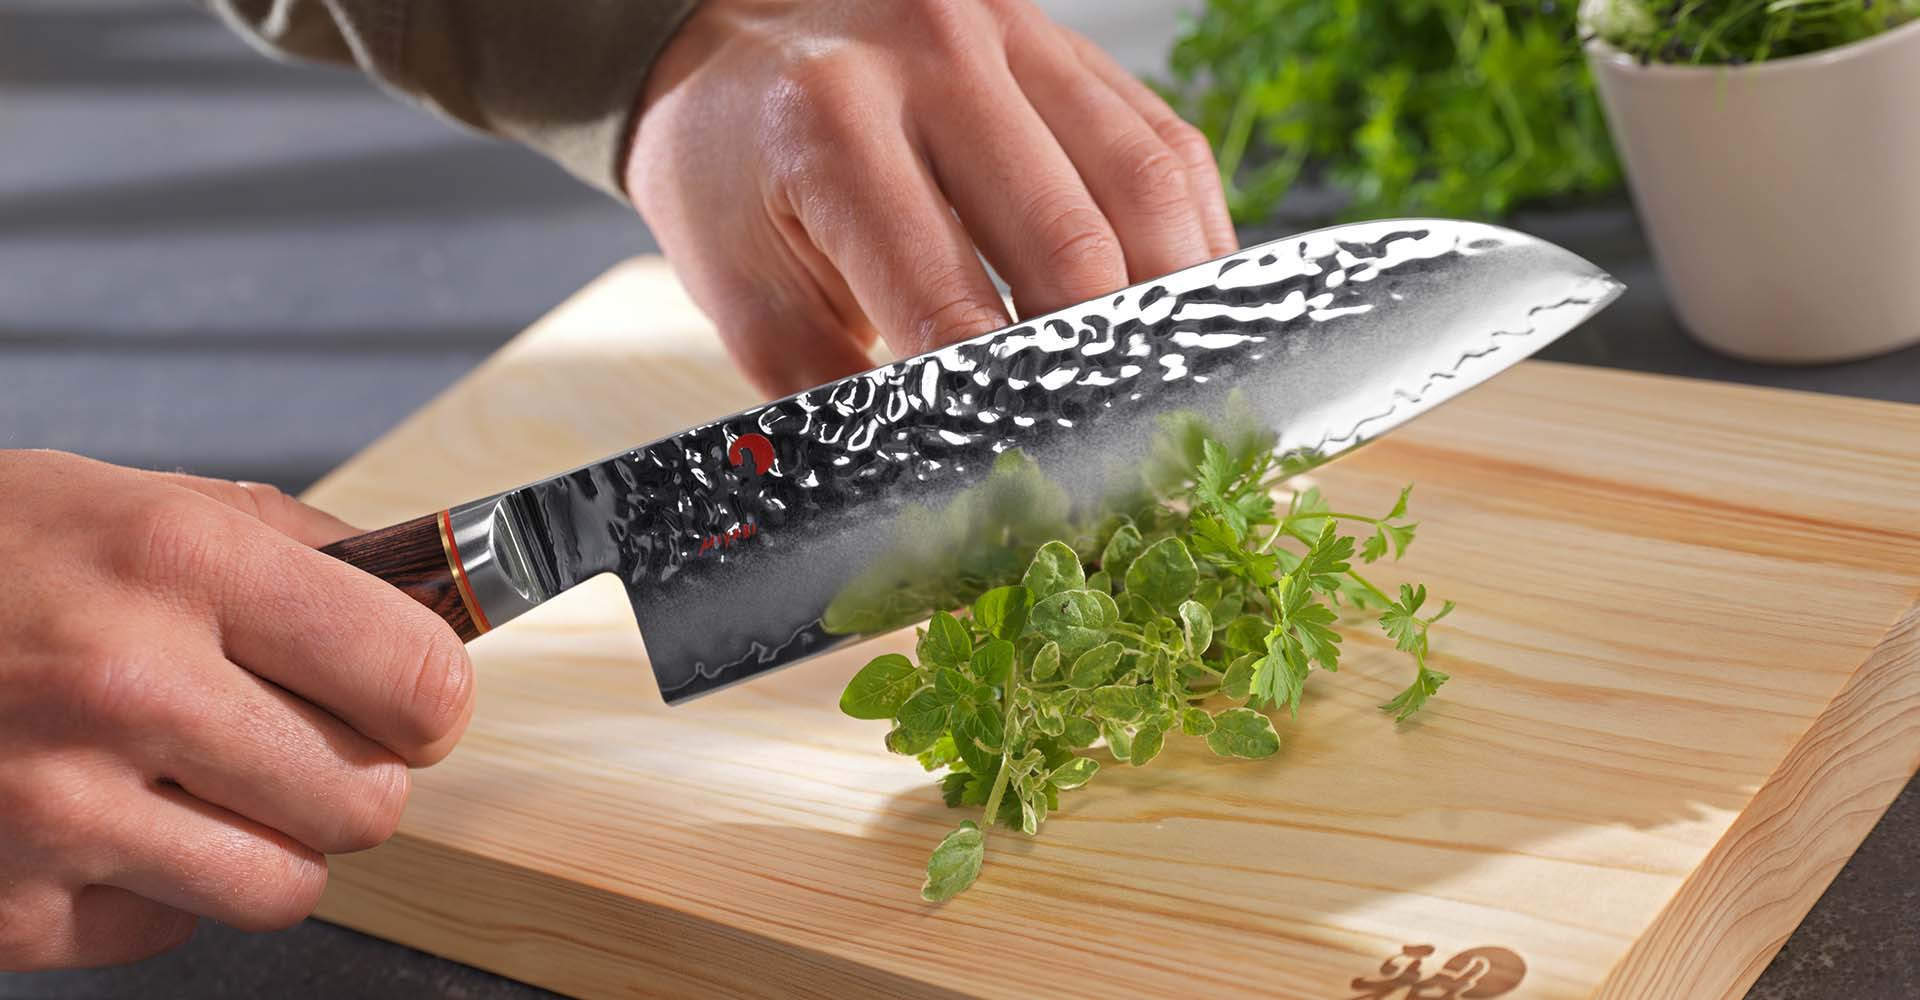 Nóż Santoku Lewa Ręka Szefa Kuchni Prestiżowa Kuchnia